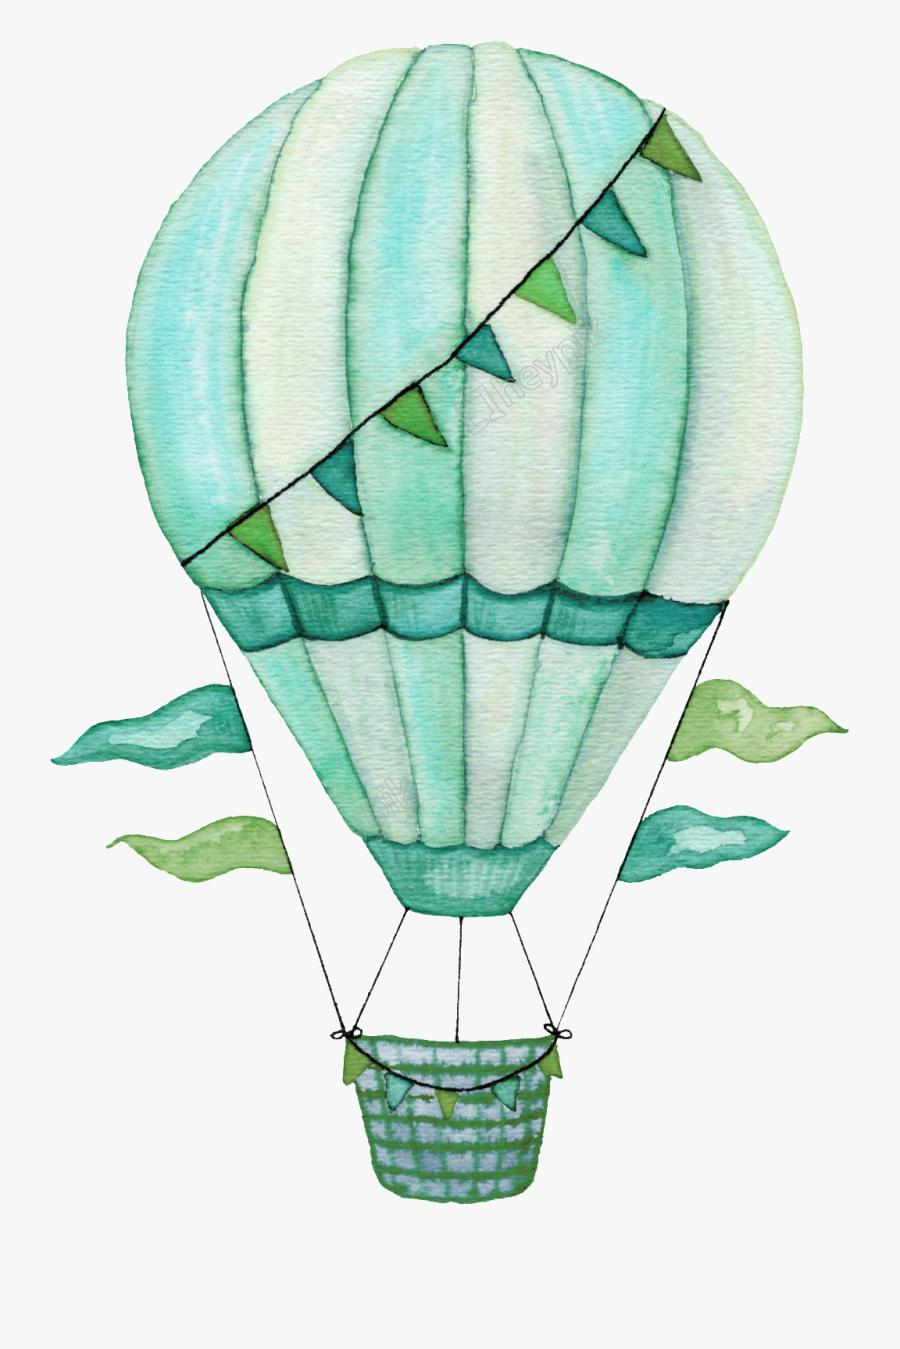 Air Balloon Png Clipart - Hot Air Balloon Clipart Png, Transparent Clipart